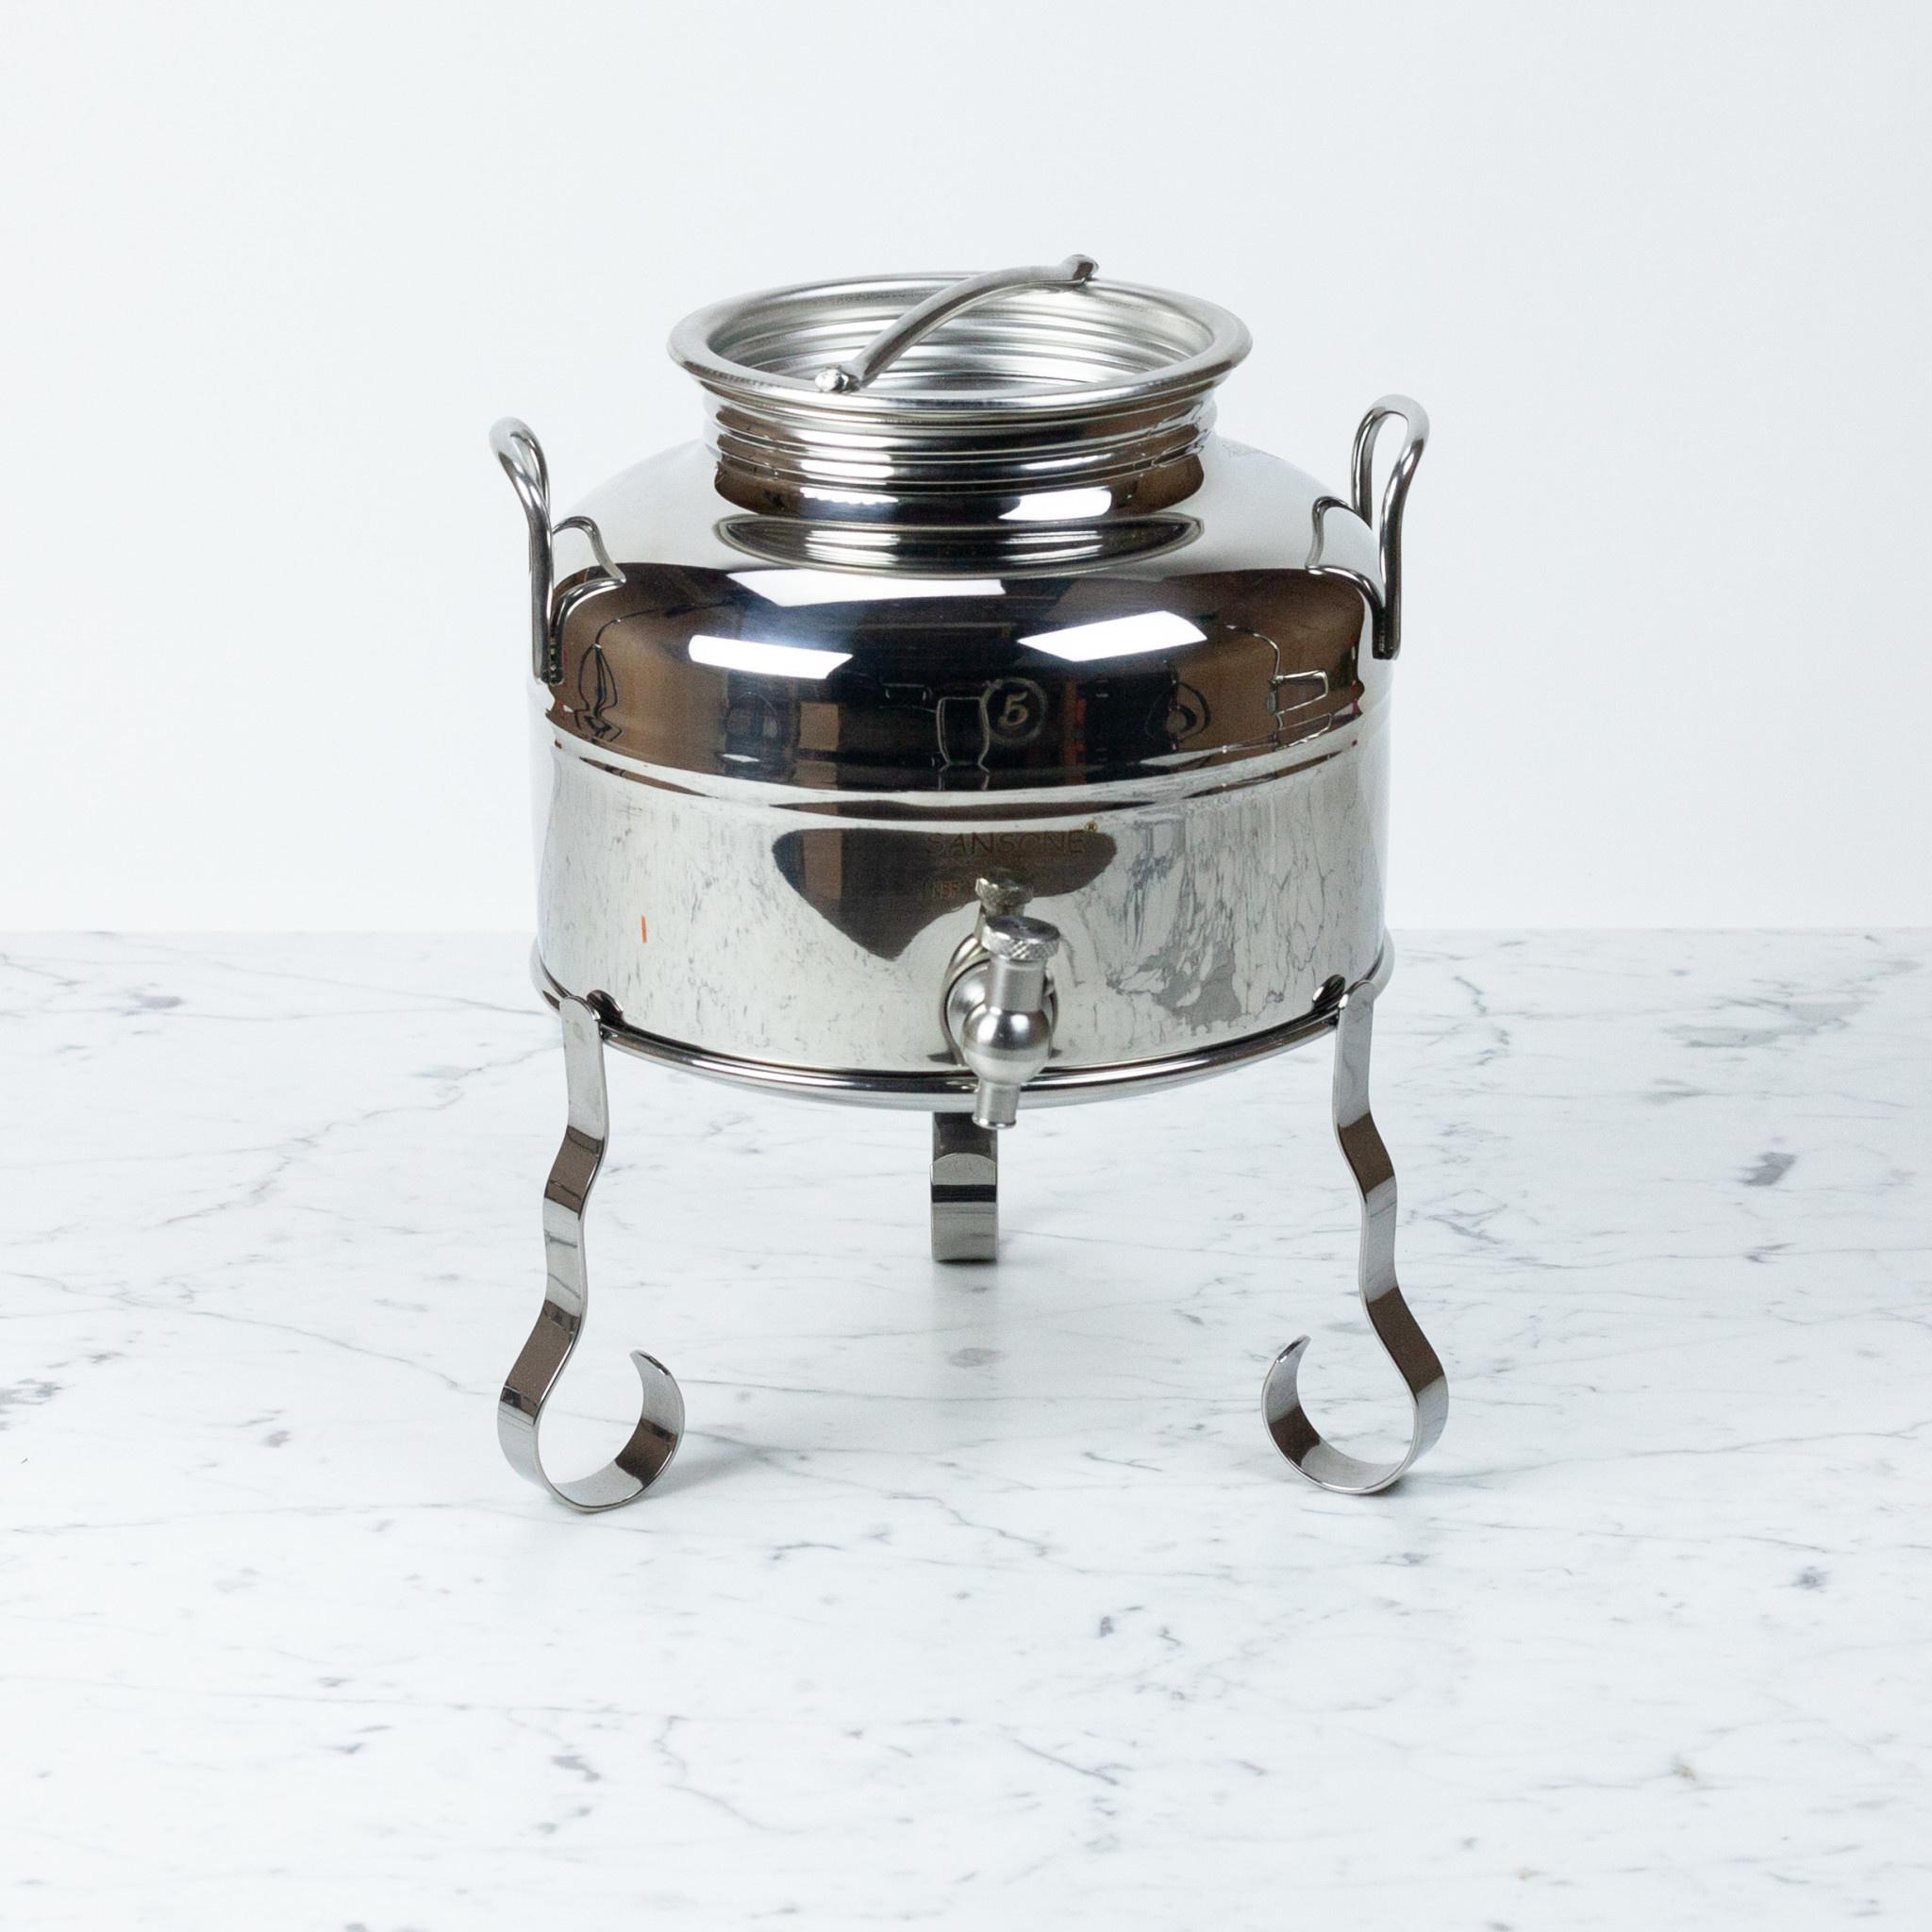 M5 Corporation Small Italian Stainless Steel Sansone Fusti Dispenser with Stand - 5 Liter